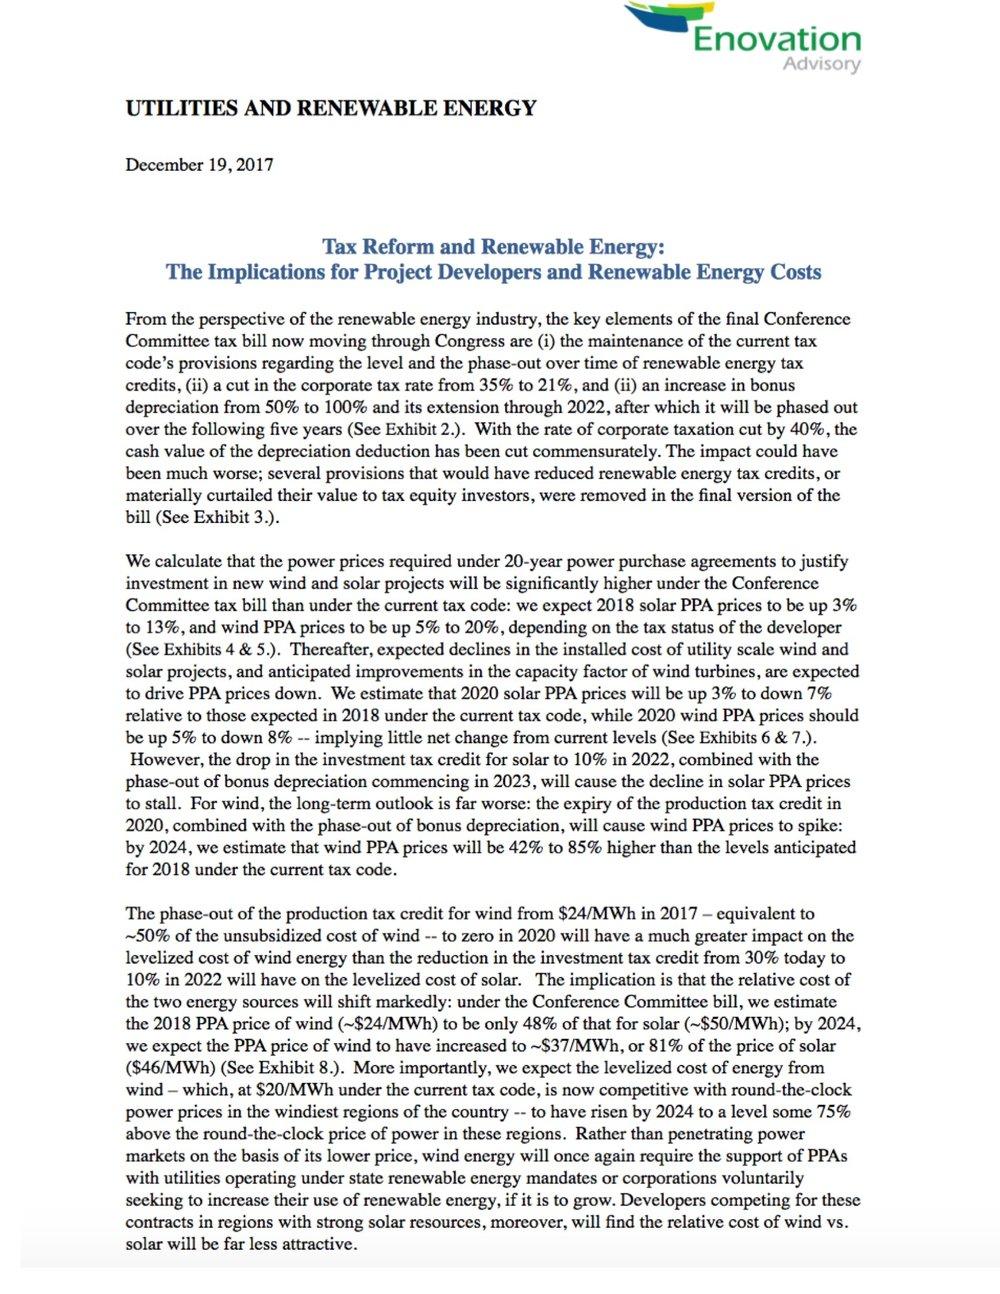 1st page image Tax Reform Renewables.jpg